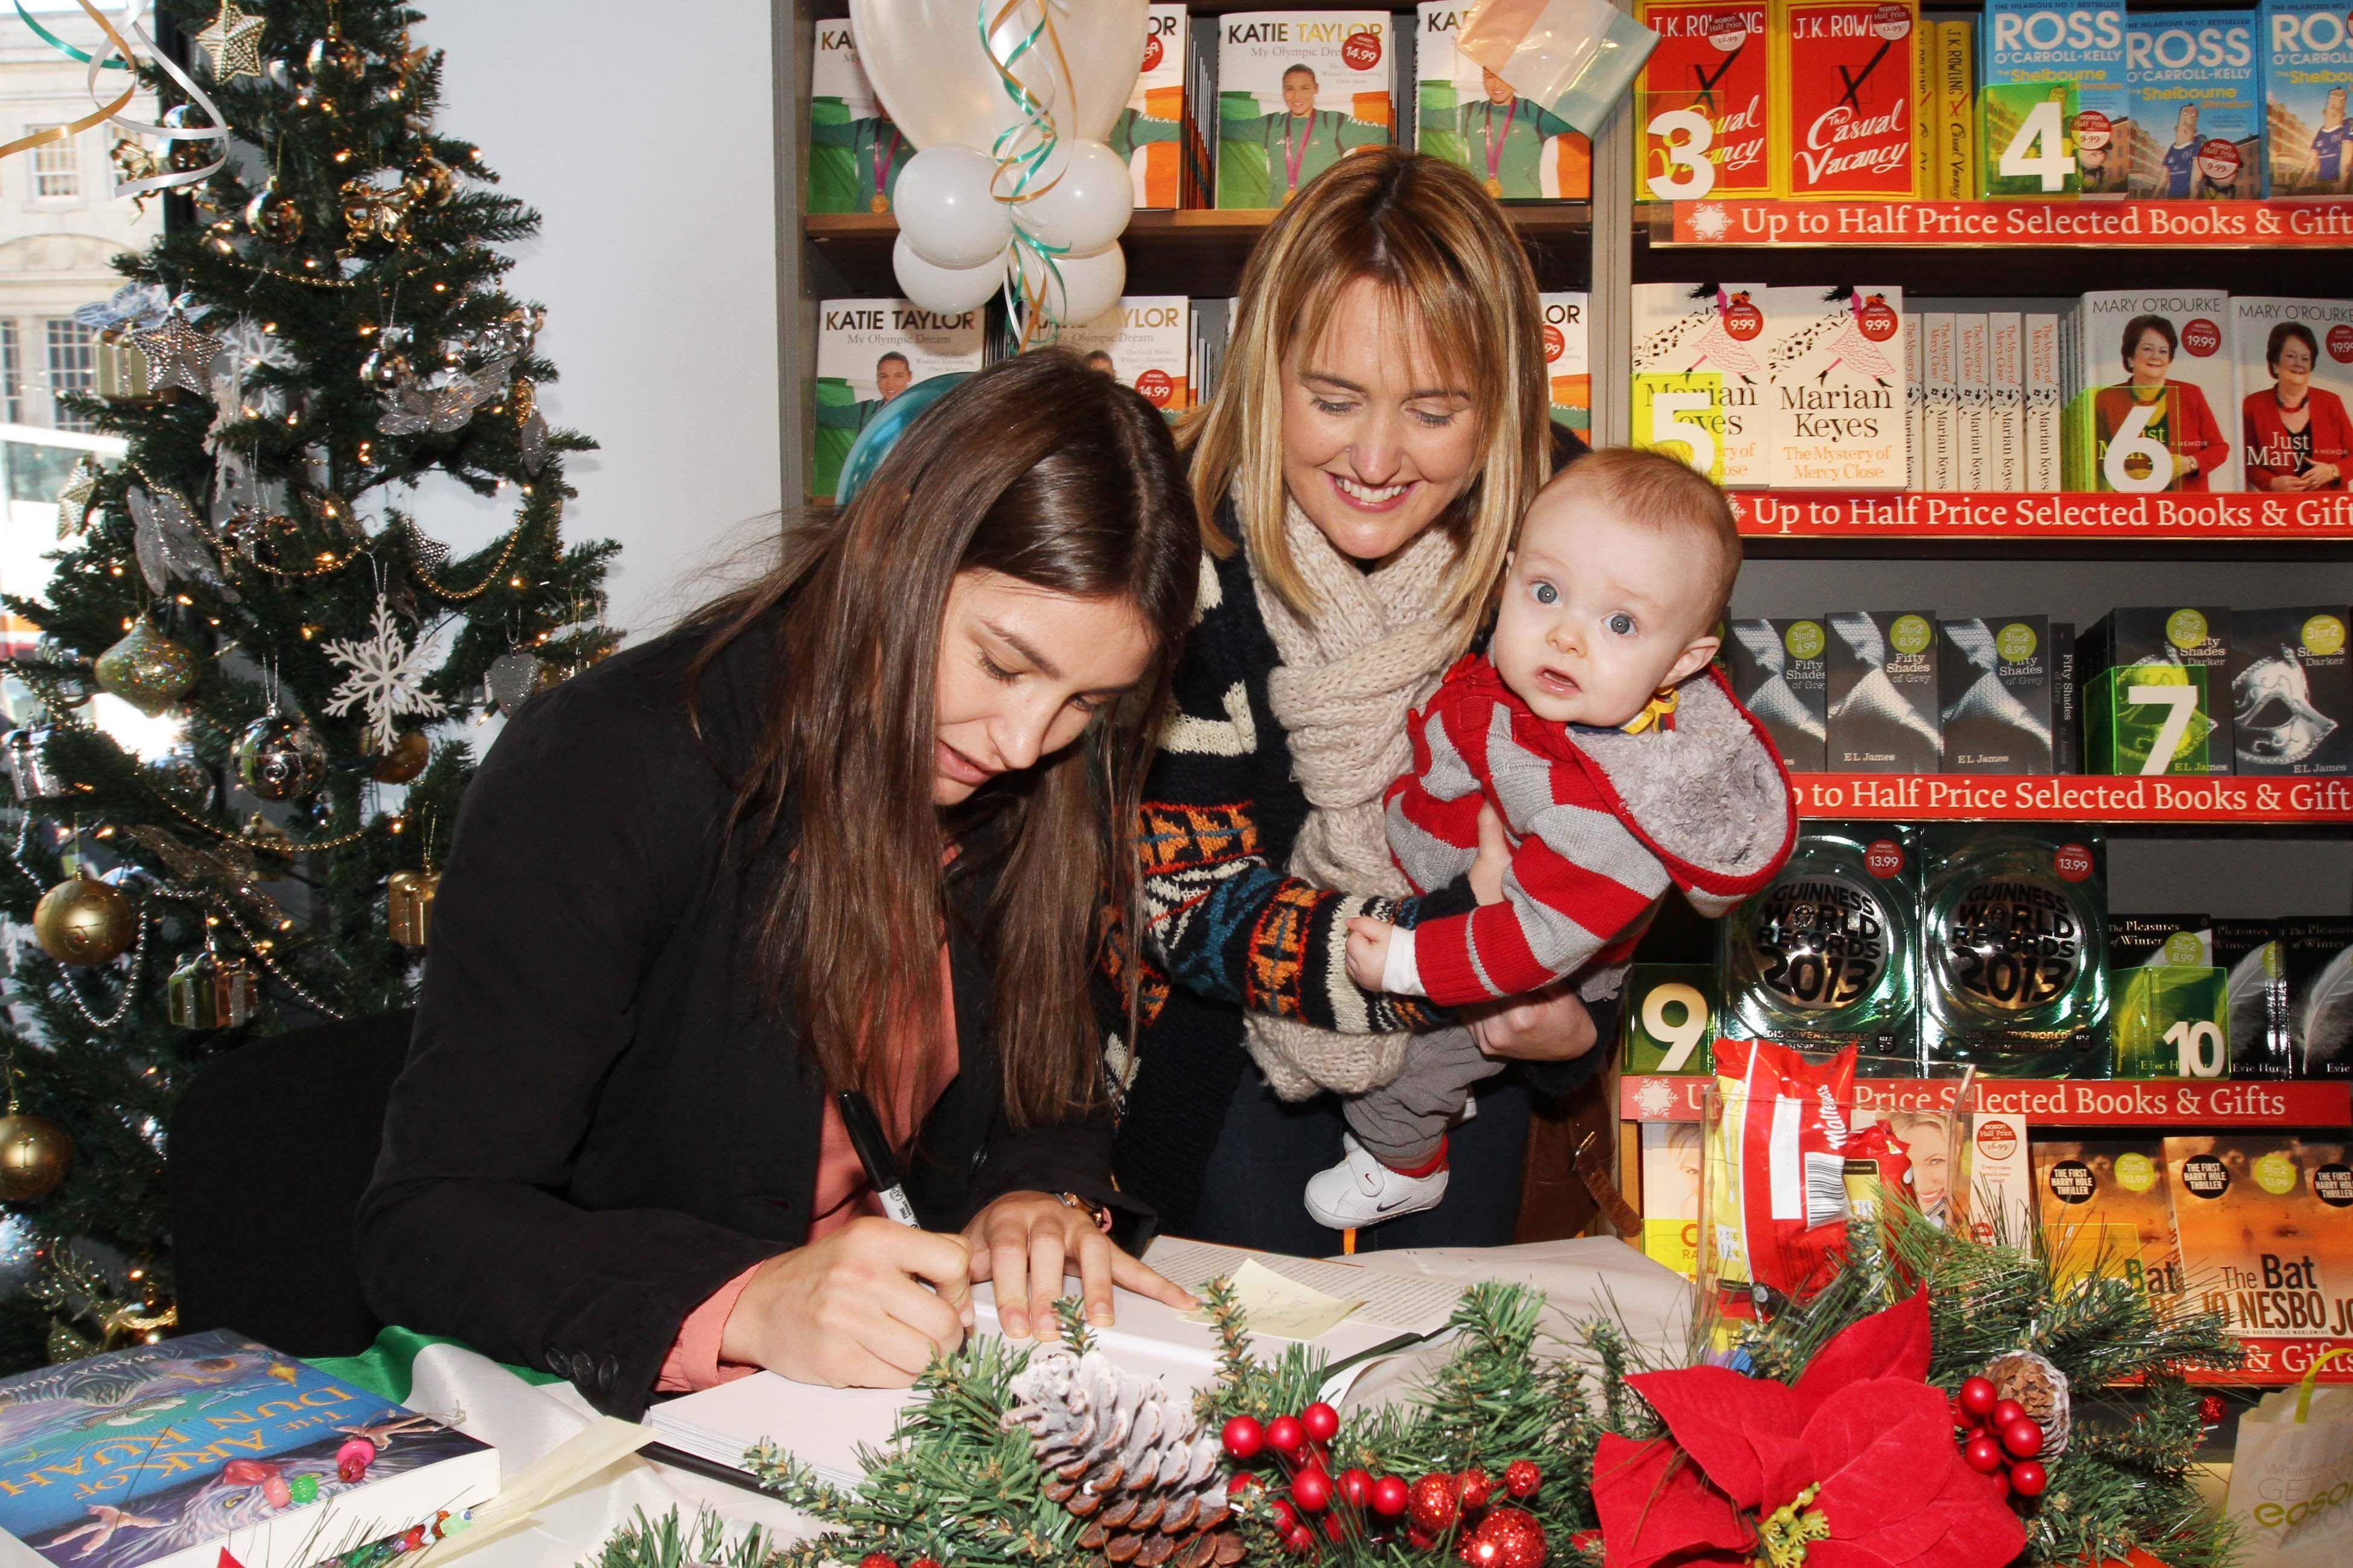 Katie Taylor book signing in Cork - Nov 2012